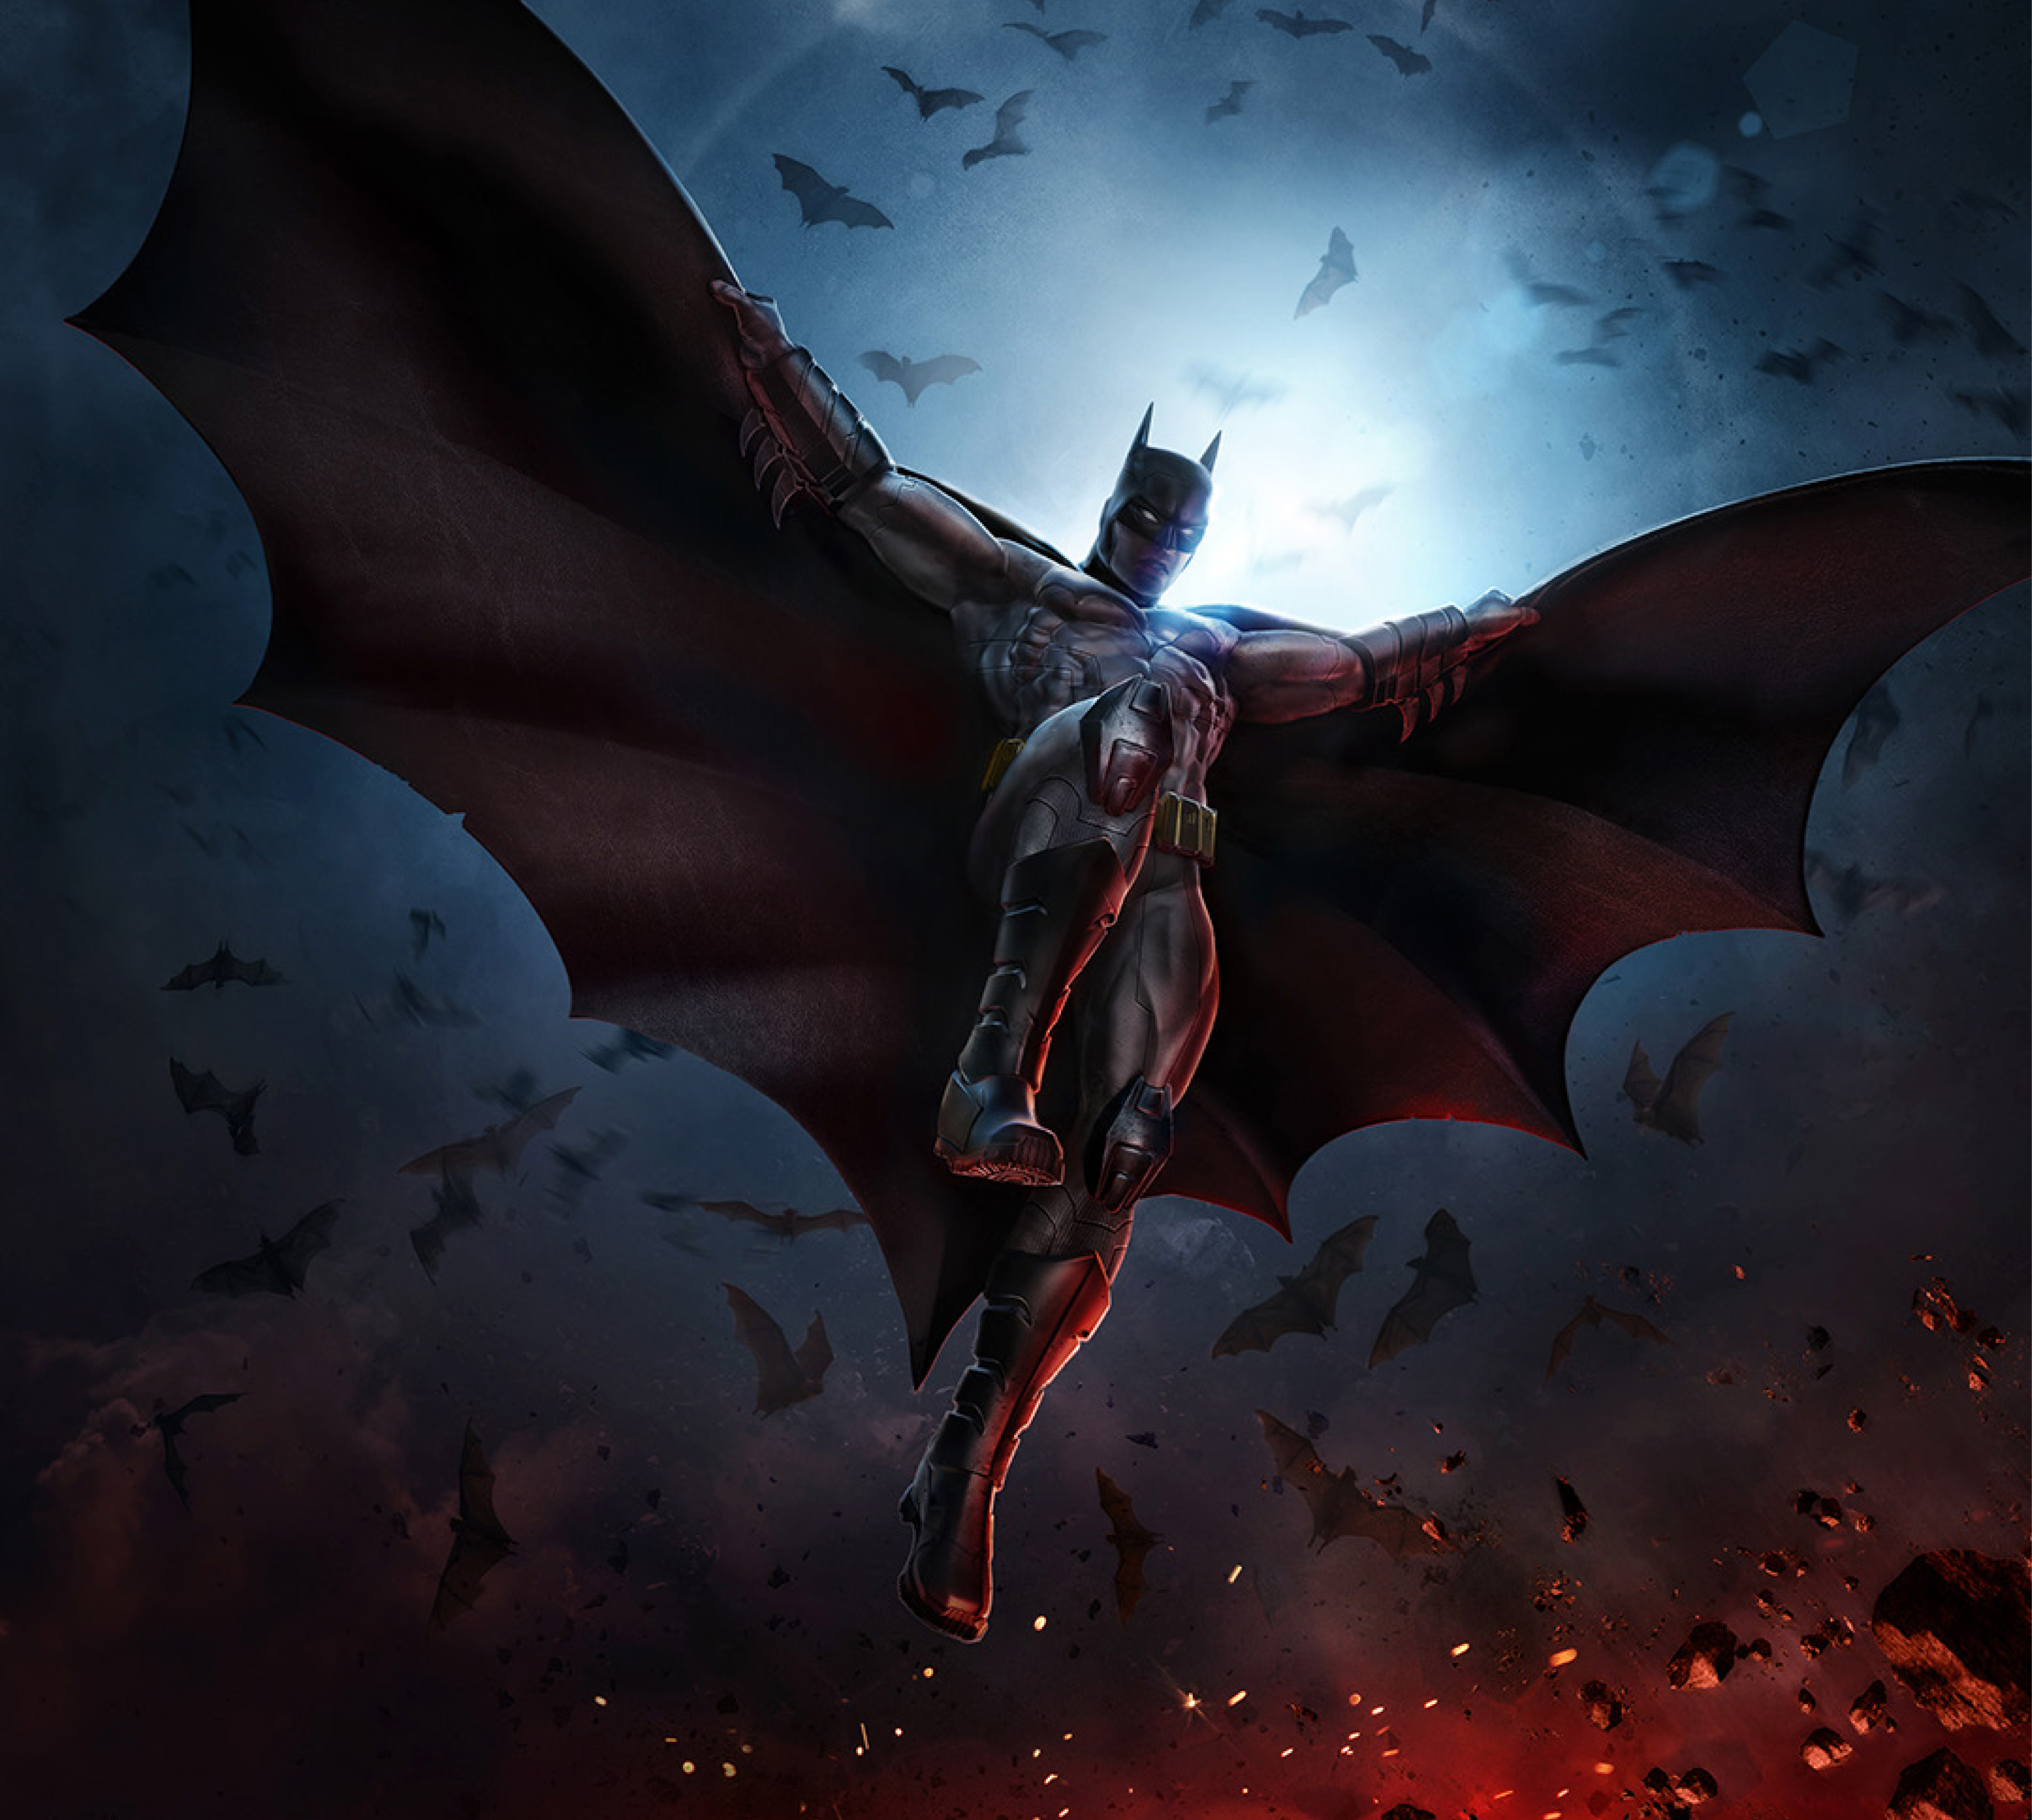 Kinzoku Bat Hd Wallpaper: Batman Key Artwork 4k, HD Superheroes, 4k Wallpapers